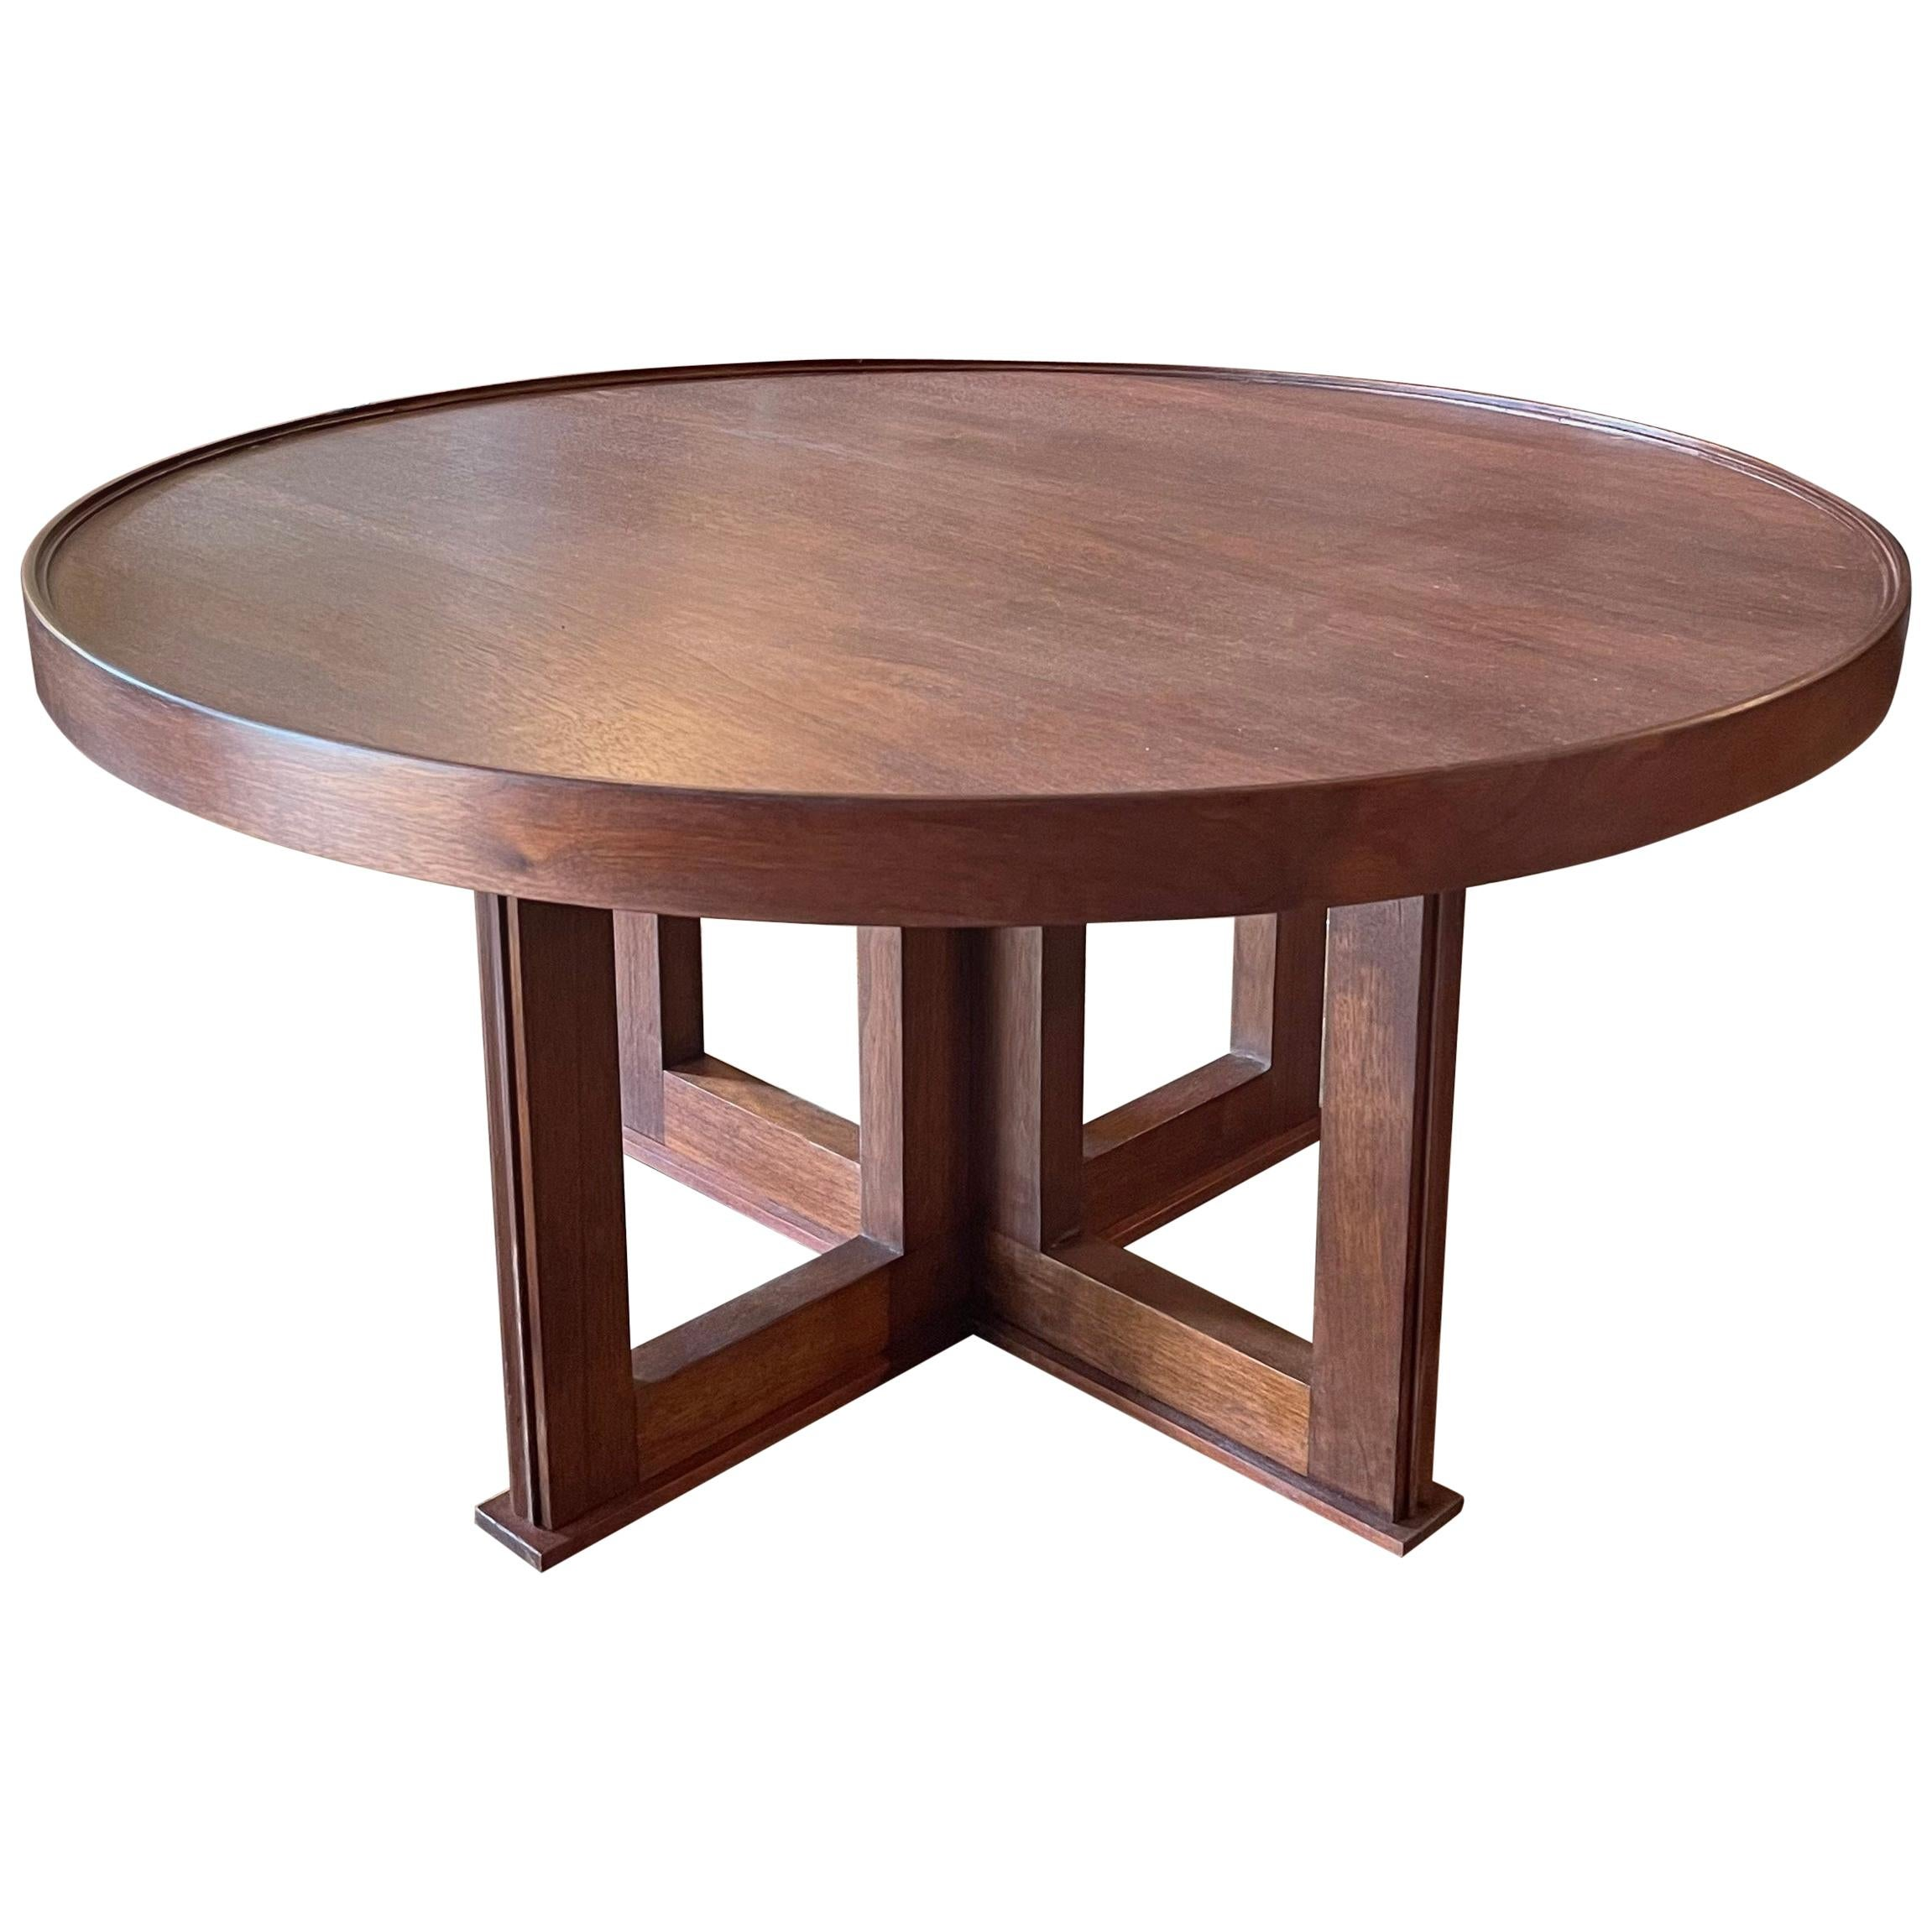 Midcentury Round Walnut Coffee Table